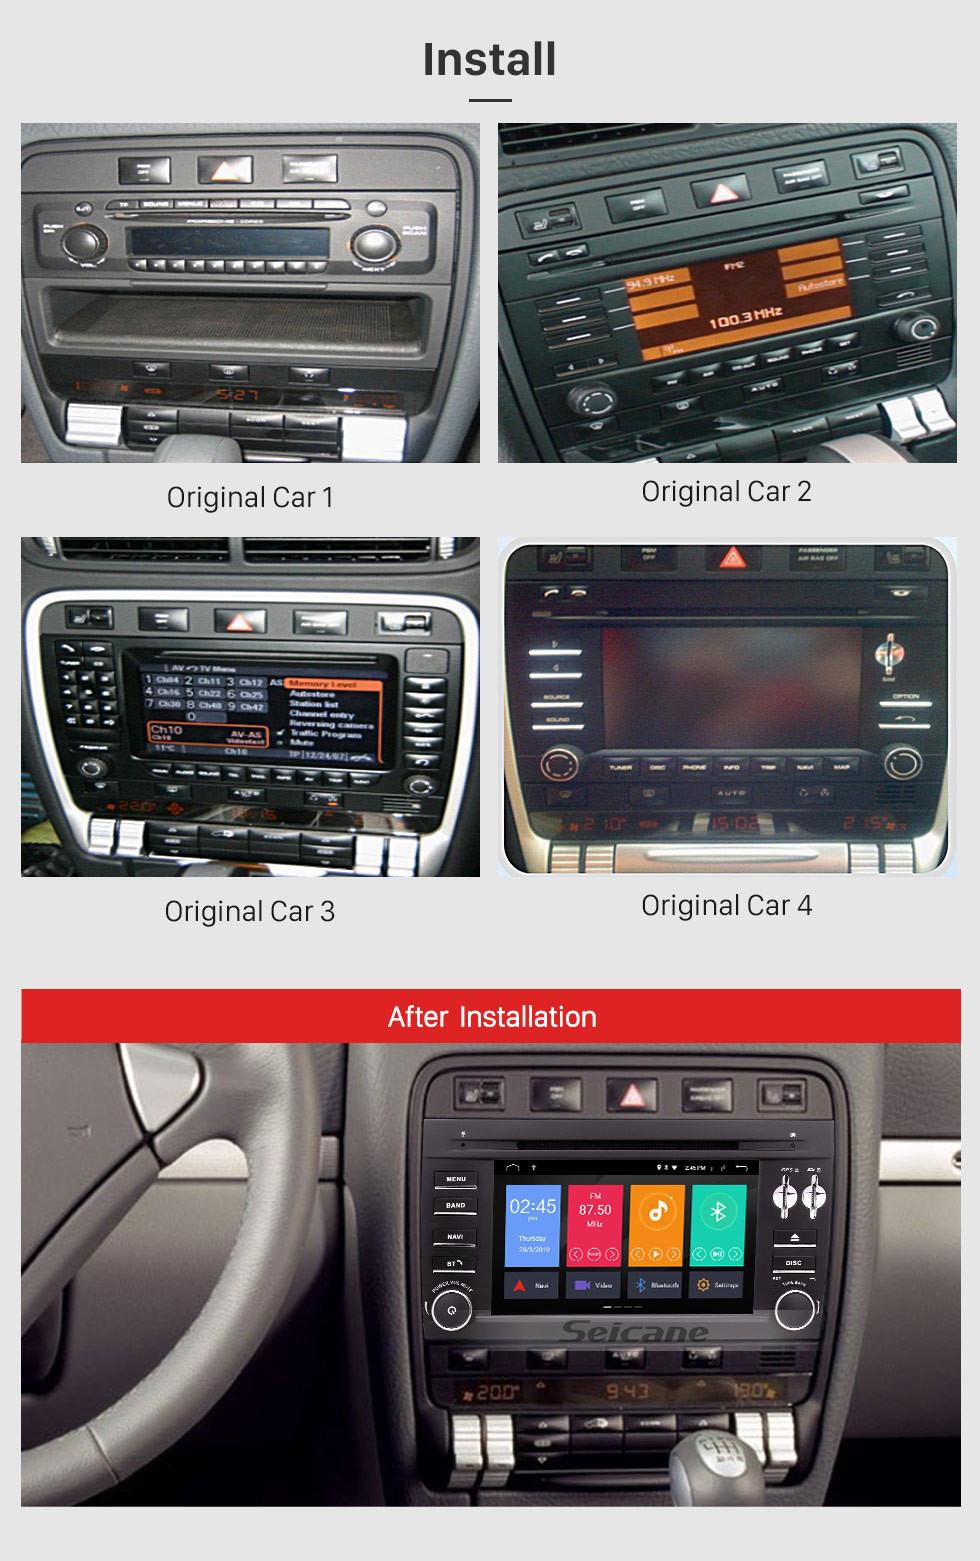 Seicane Android 10.0 Navegación GPS Radio de 7 pulgadas para 2003 2004 2005 2006-2010 Porsche Cayenne Reproductor de DVD para coche Bluetooth Teléfono Espejo Enlace Control del volante